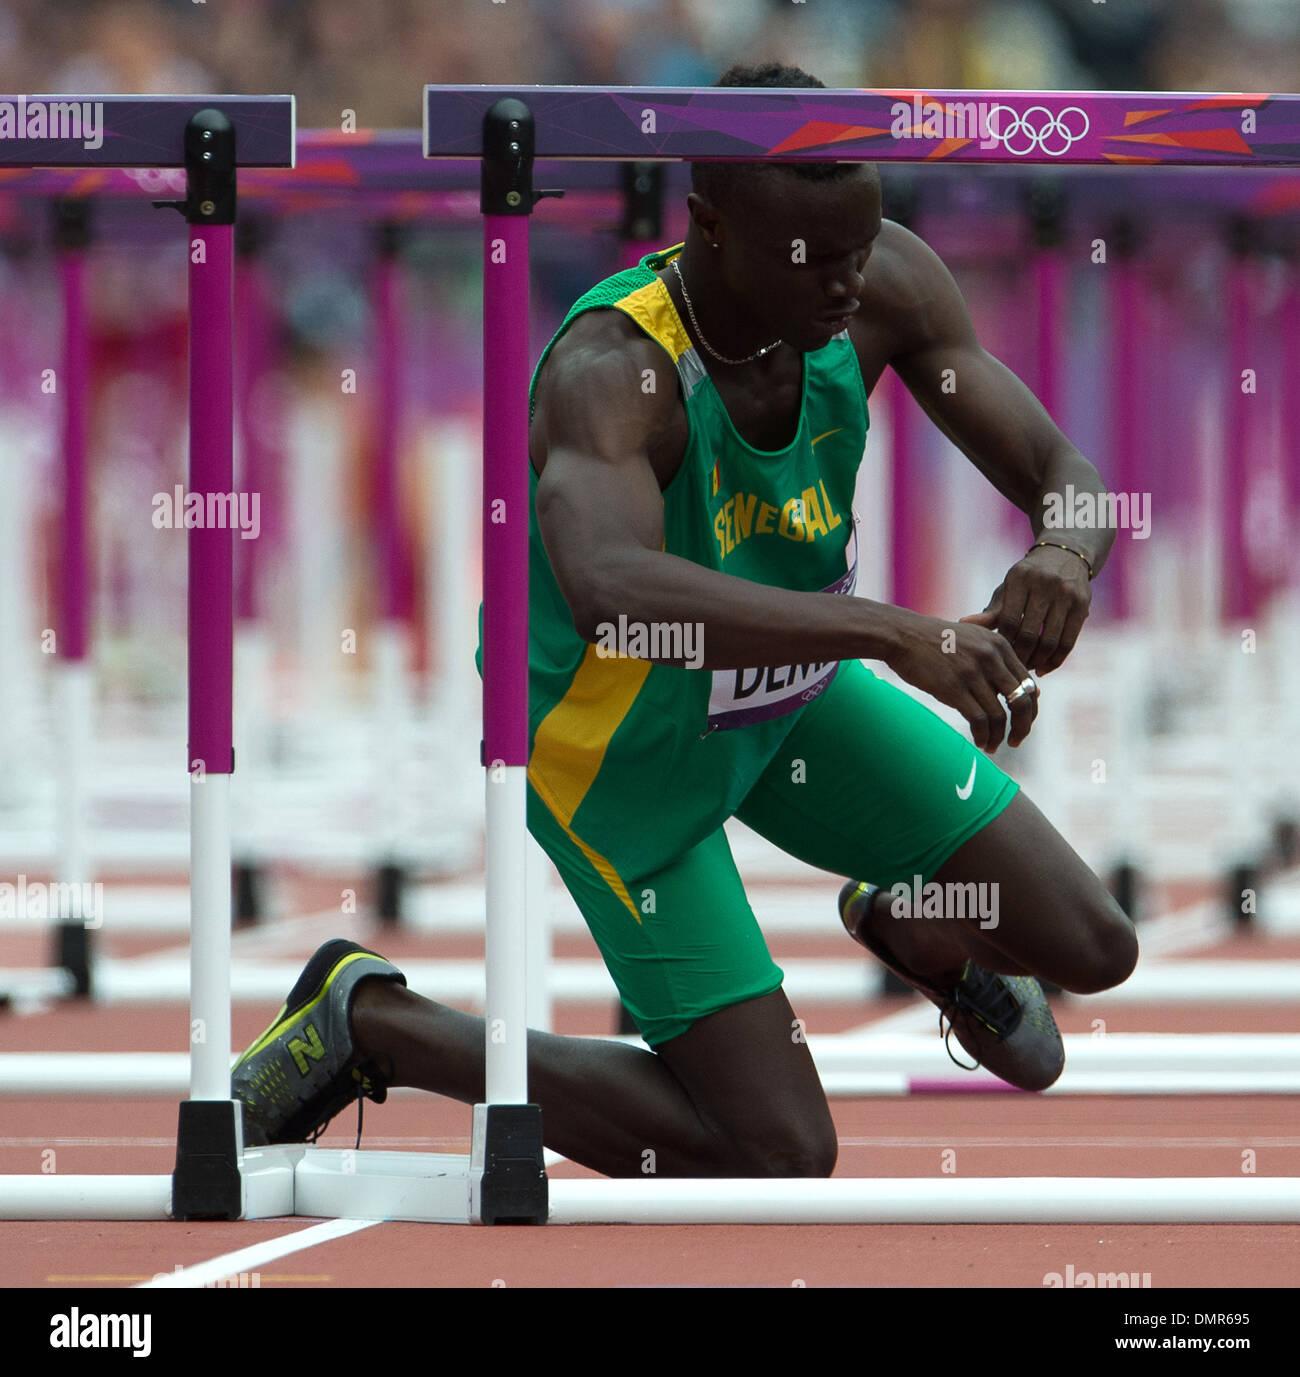 Moussa Dembele London 2012 Olympic Games - Men's 110m Hurdles - Olympic Stadium London England - 07.08.12 - Stock Image